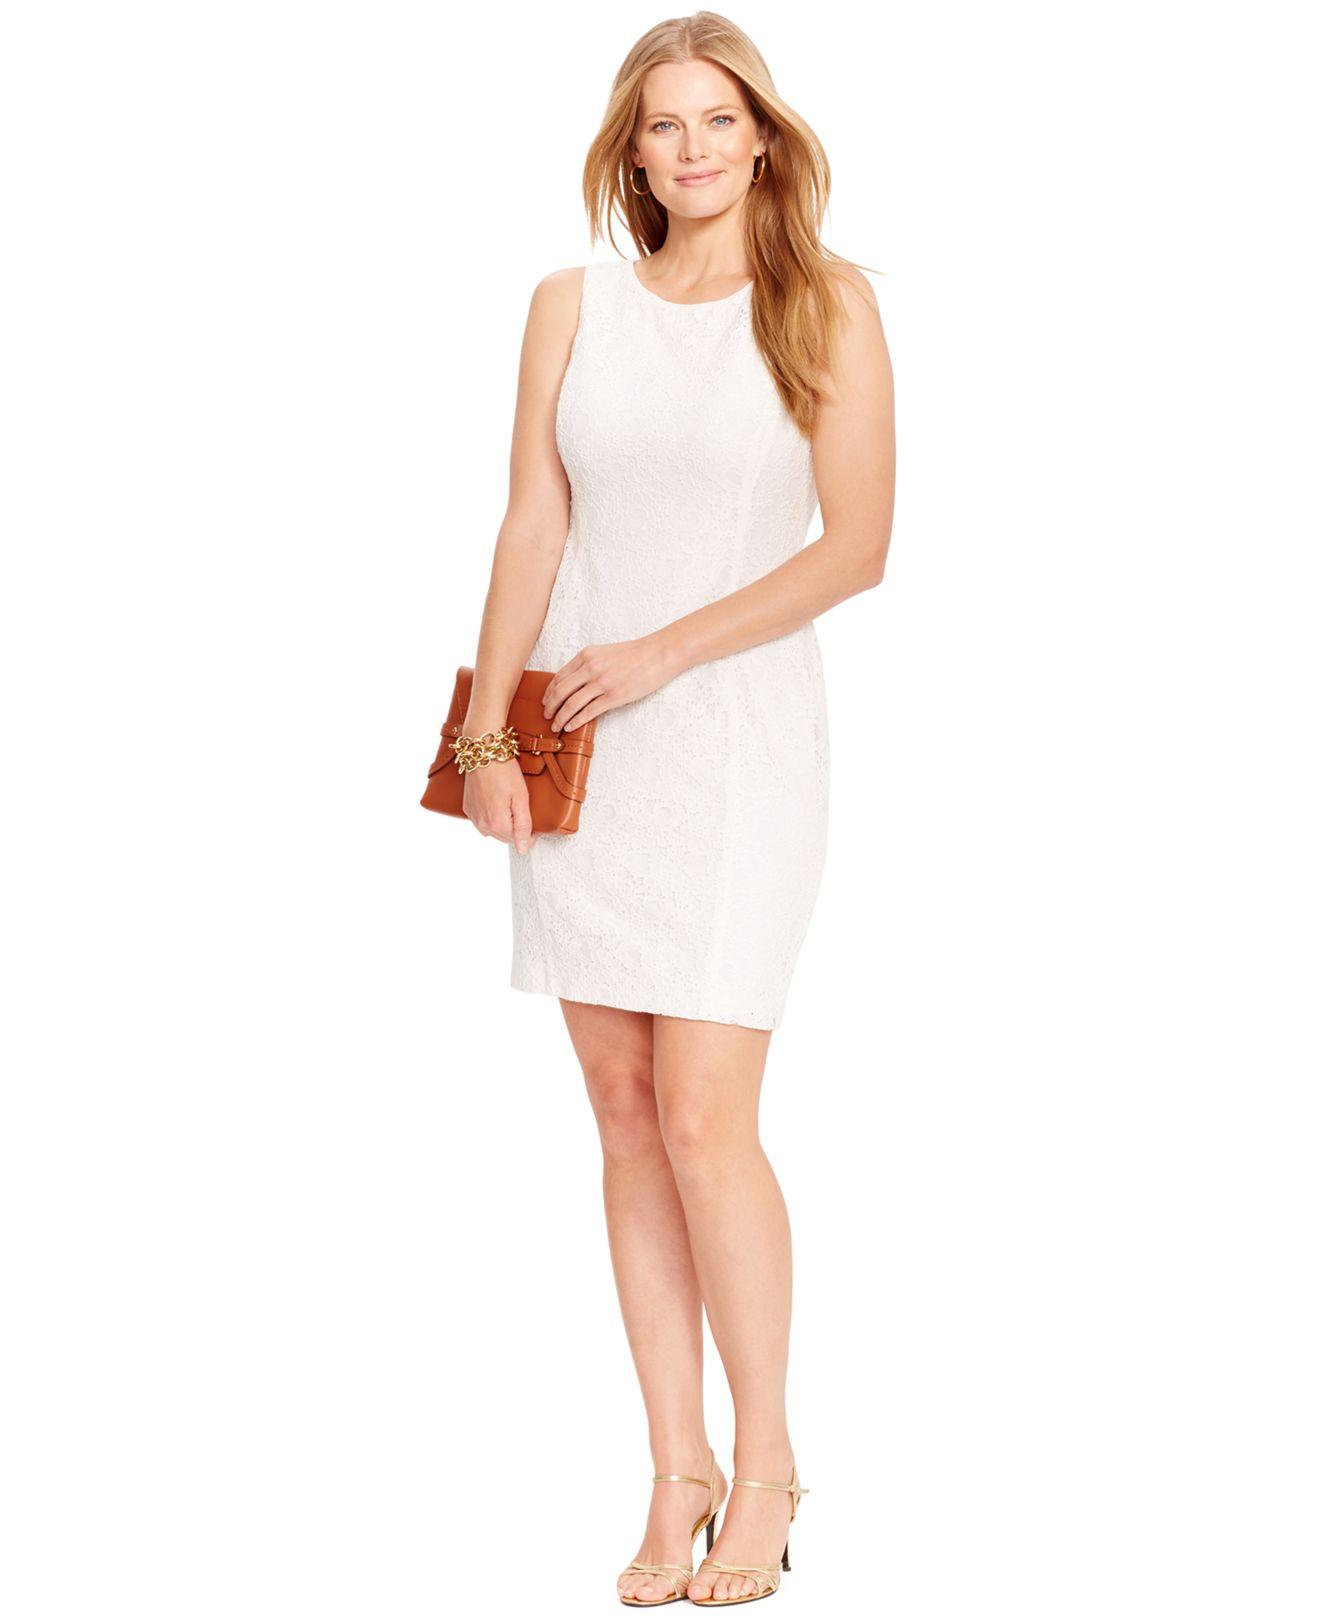 Lauren by Ralph Lauren White Plus Size Sleeveless Lace Dress